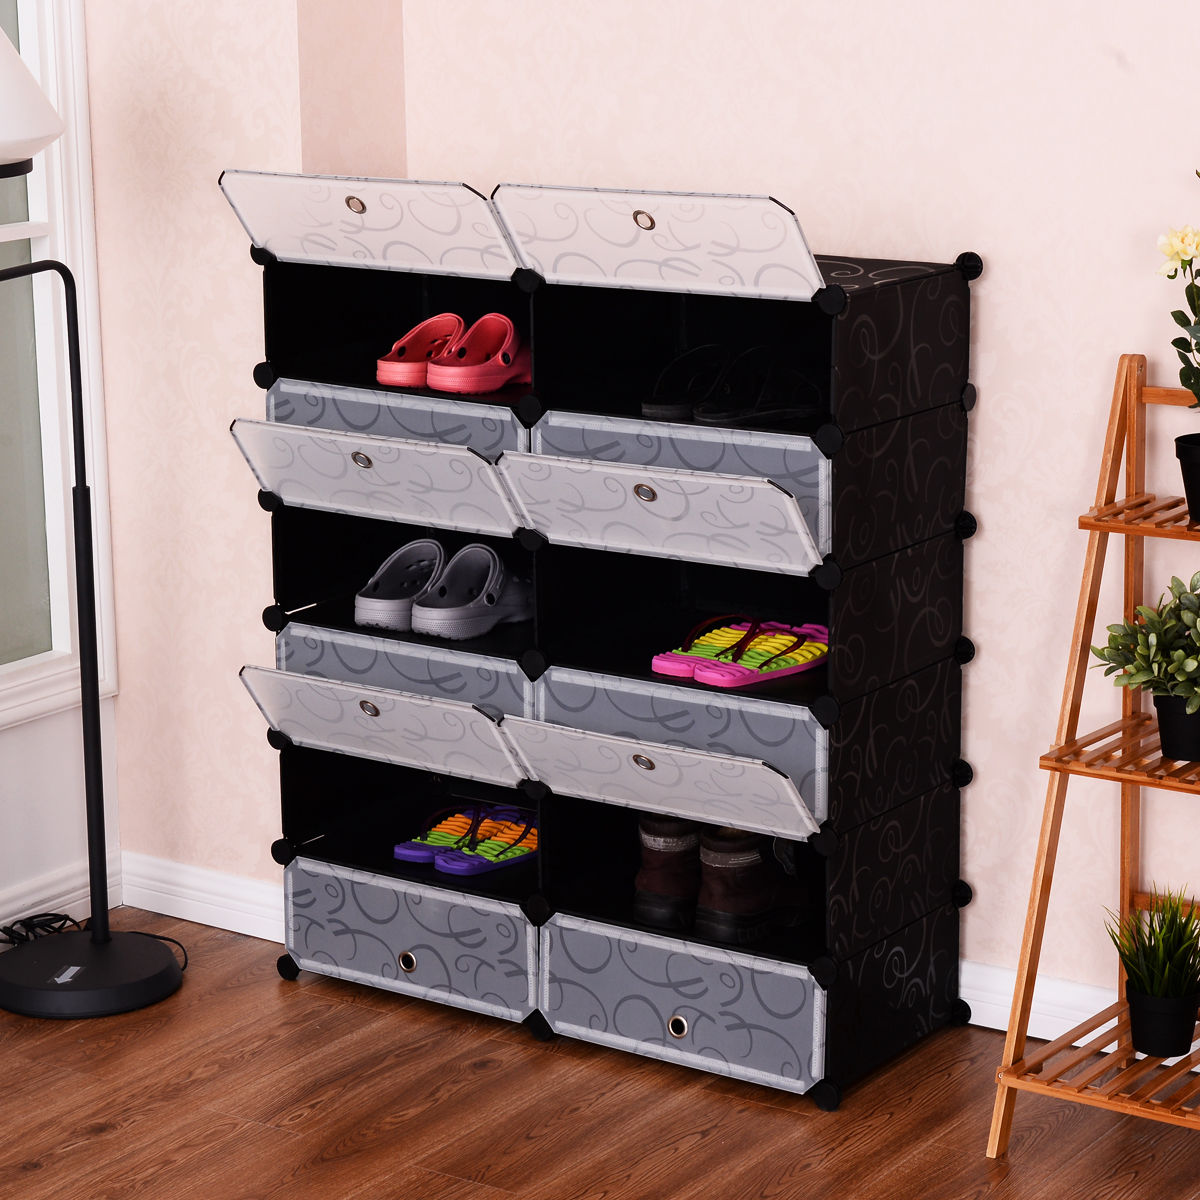 Giantex 12 Cubic Portable Shoe Rack Shelf Modern Waterproof Shoes Cabinet Storage Closet Shoe Organizer Home Furniture HW54796